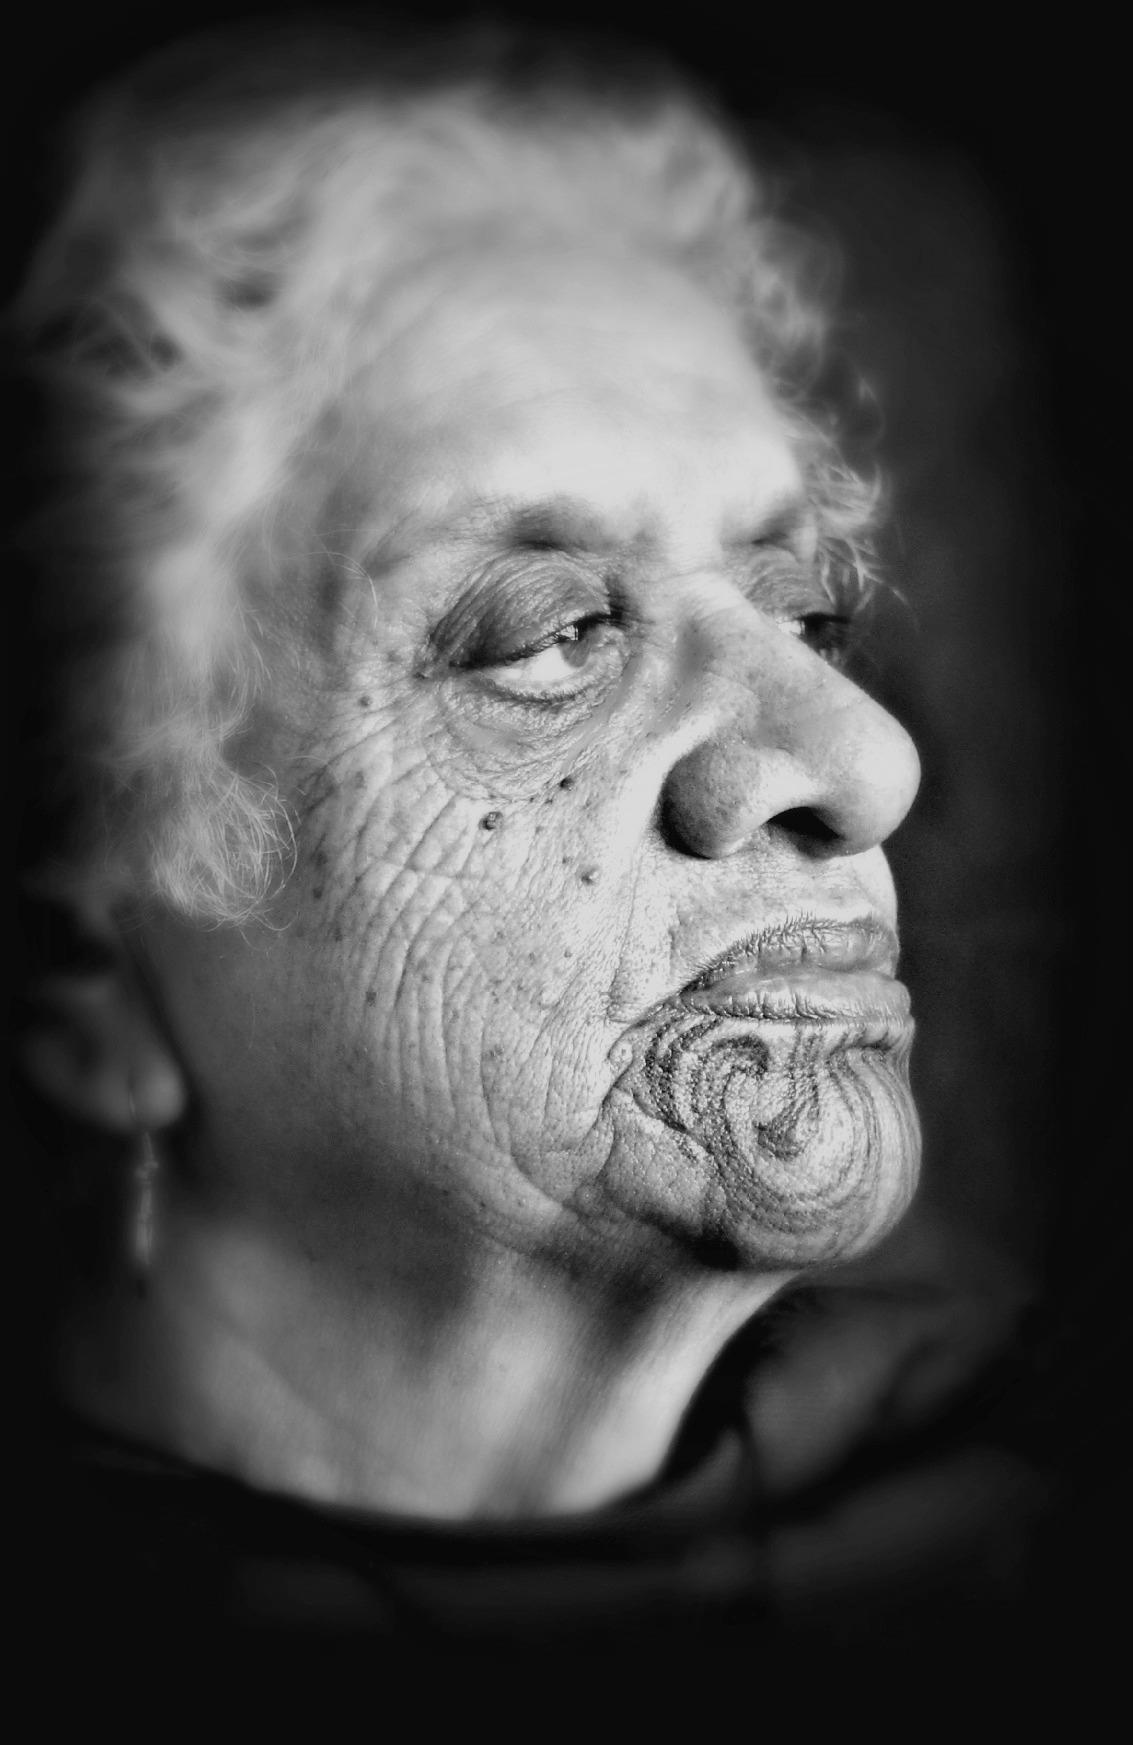 Angeline Girlie Pourau QSM 1942 - 2015